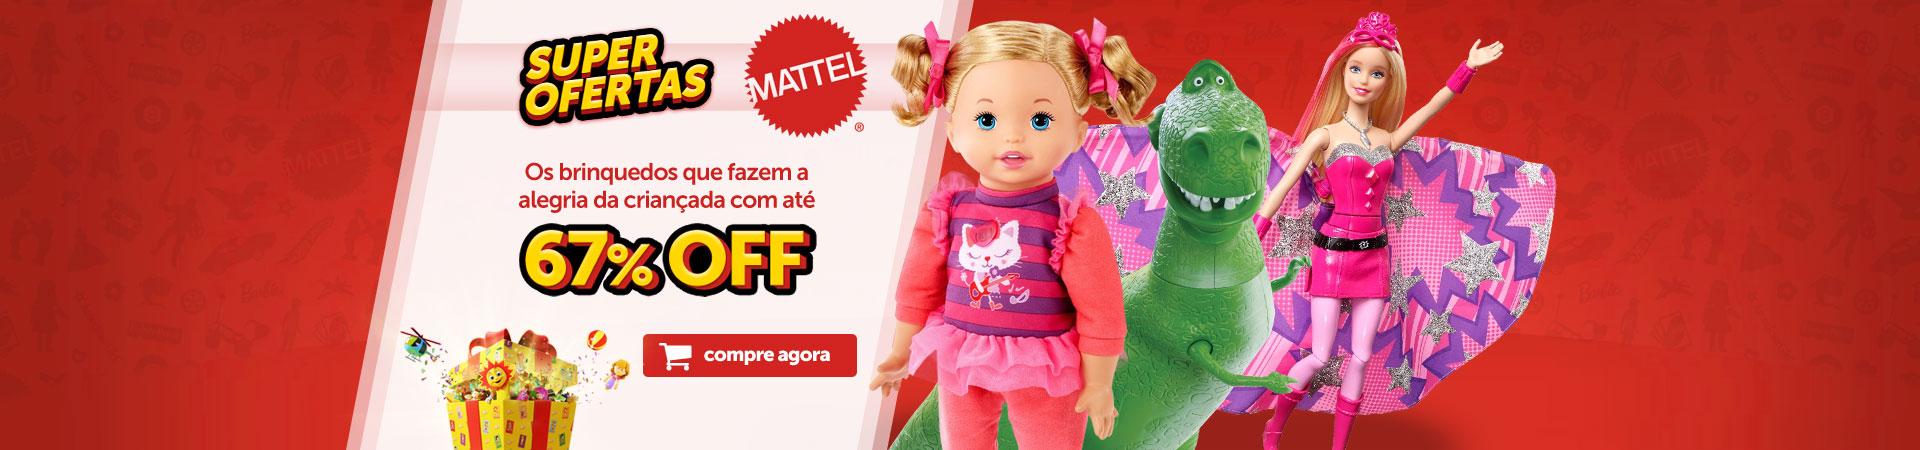 Ofertas Mattel